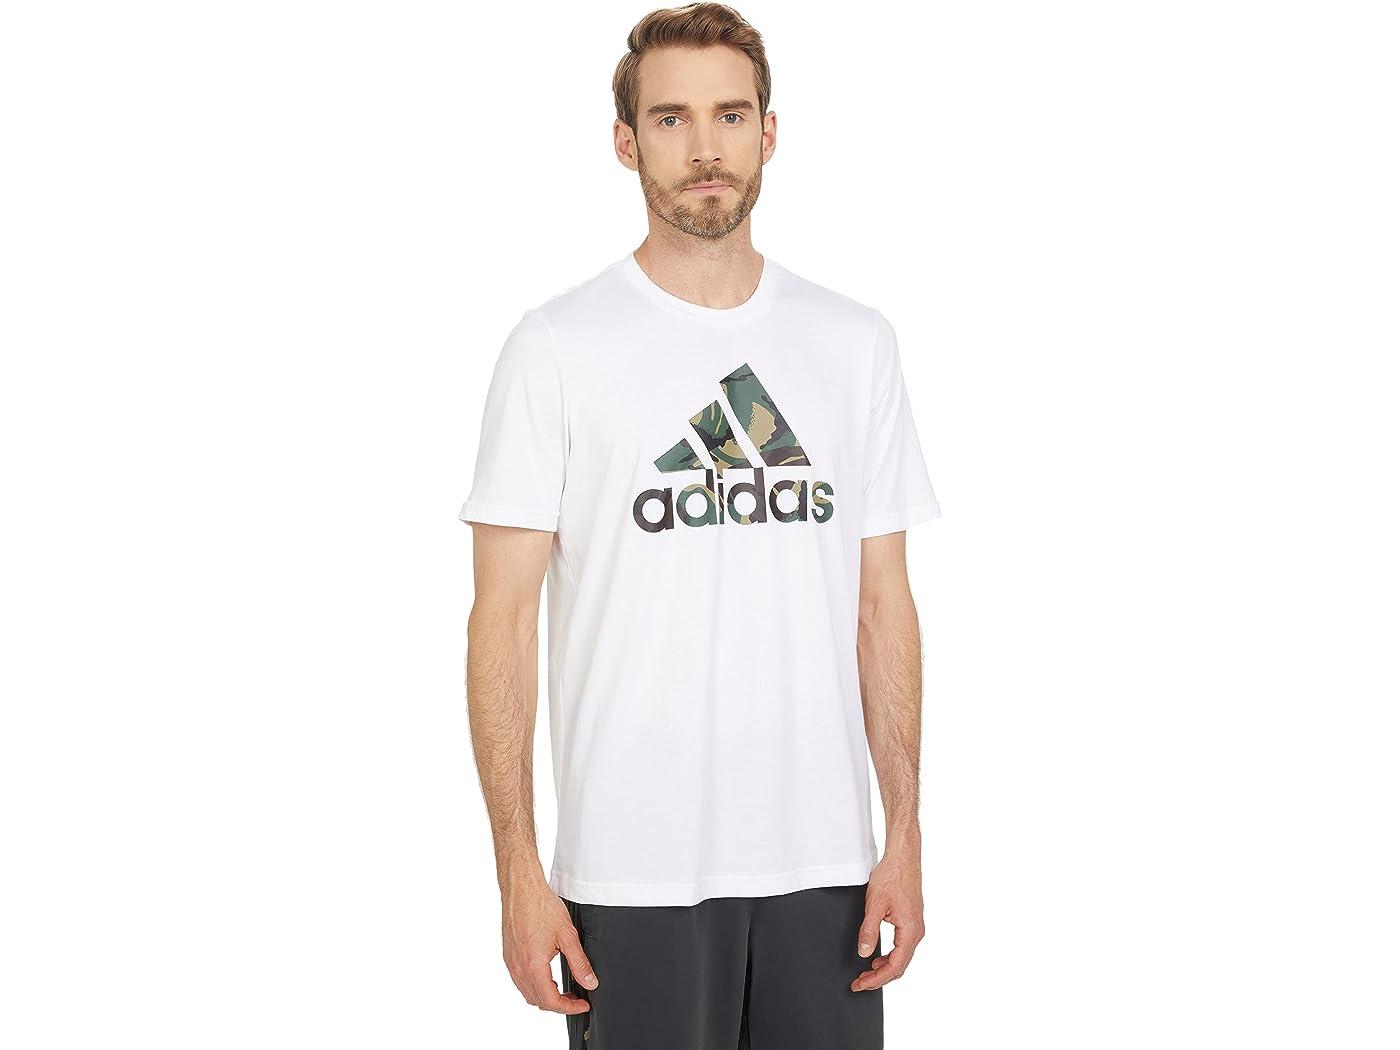 Adidas Camo Print Tee